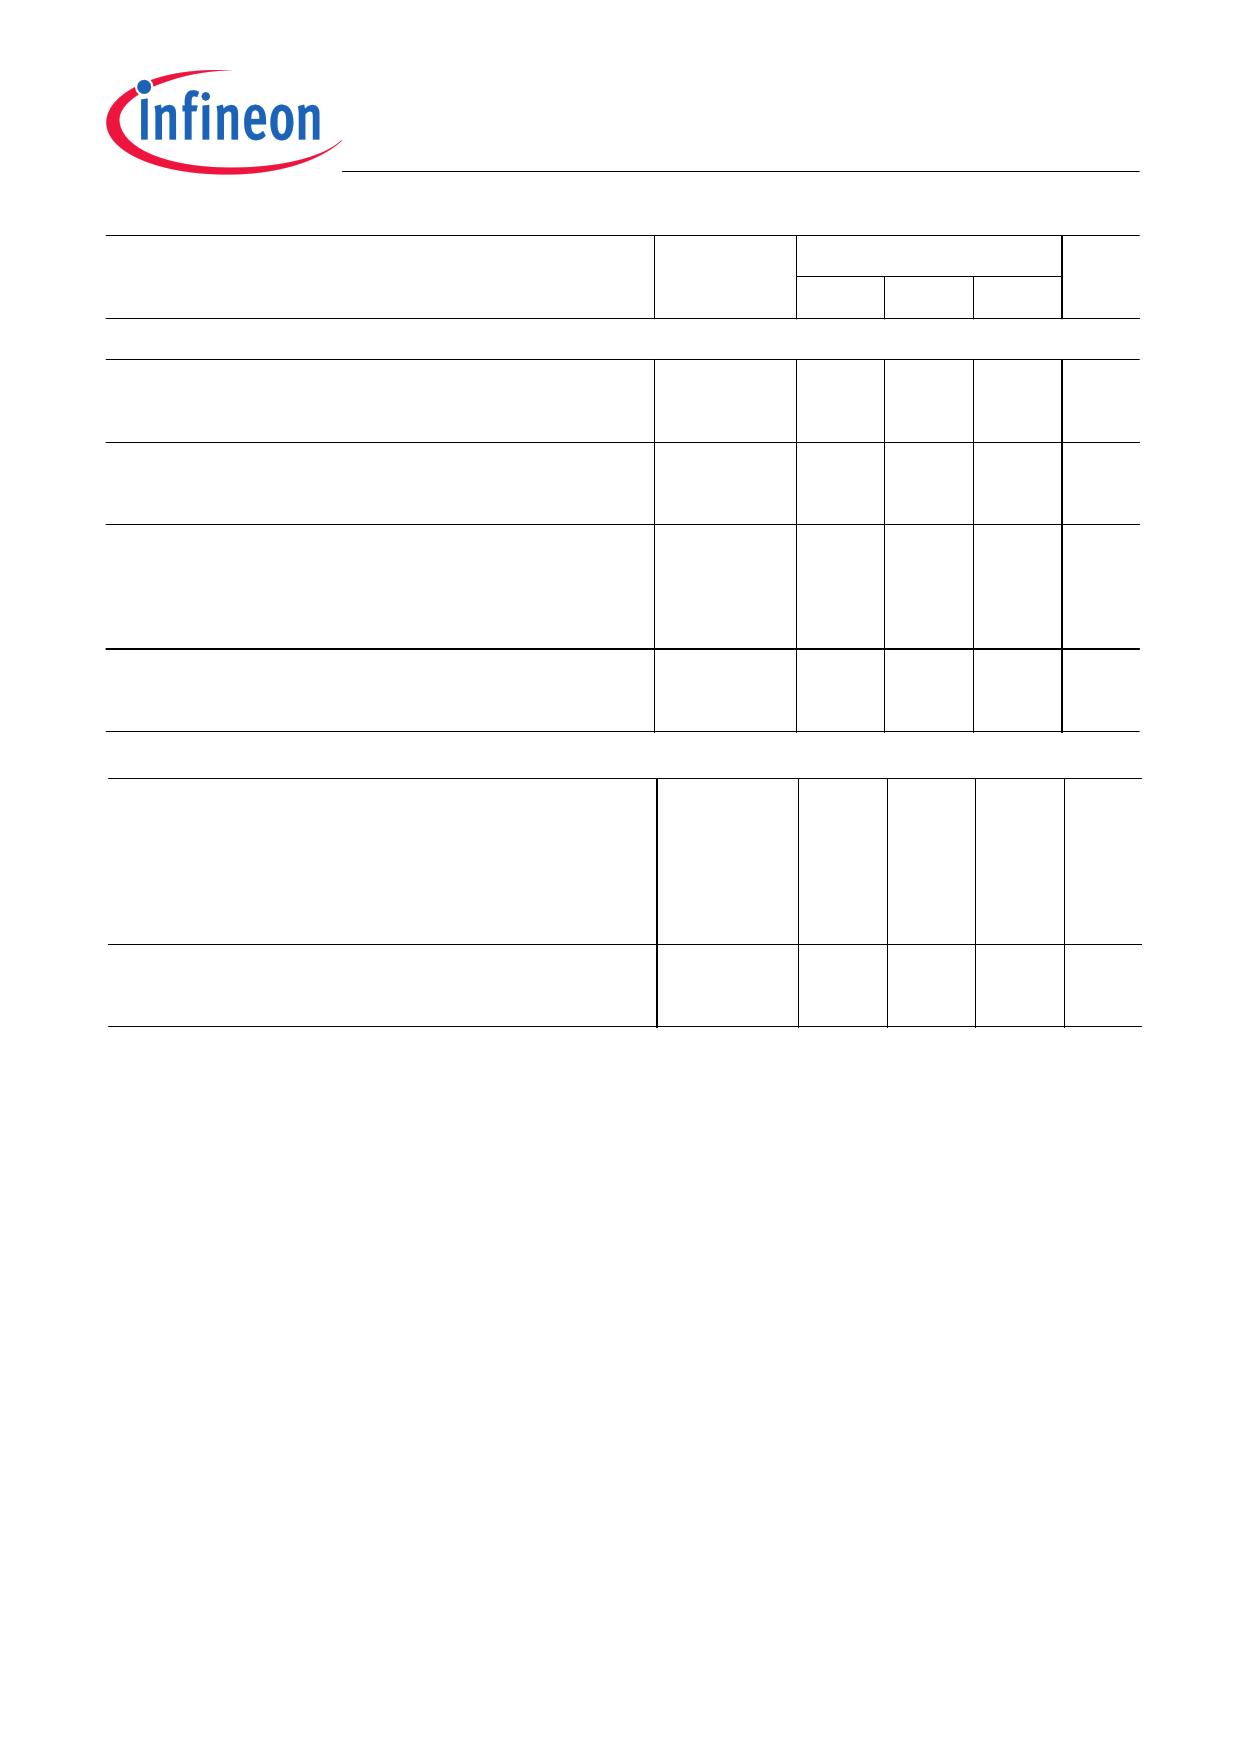 Datasheet Bat15 04w Pdf 【 Pinout 】 Silicon Schottky Diodes